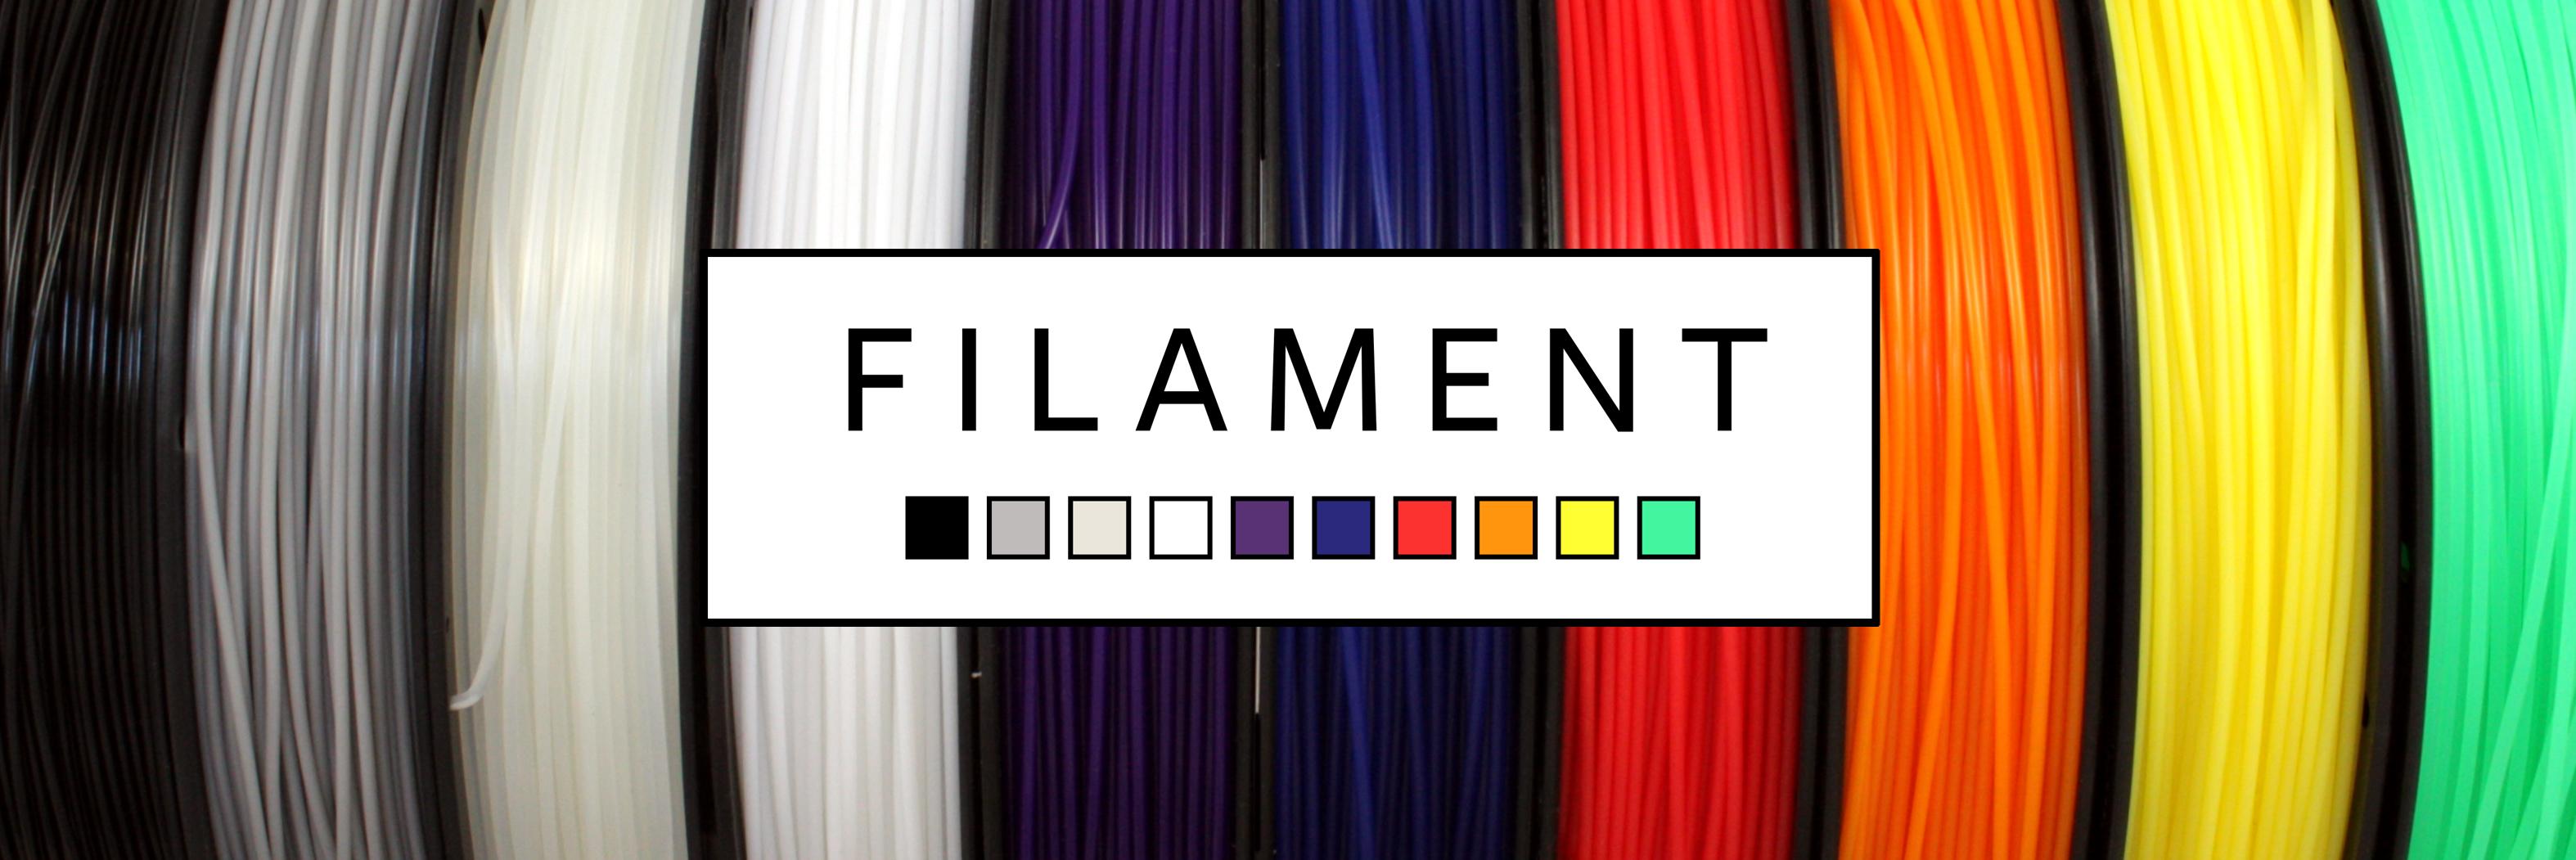 Panospace Filaments